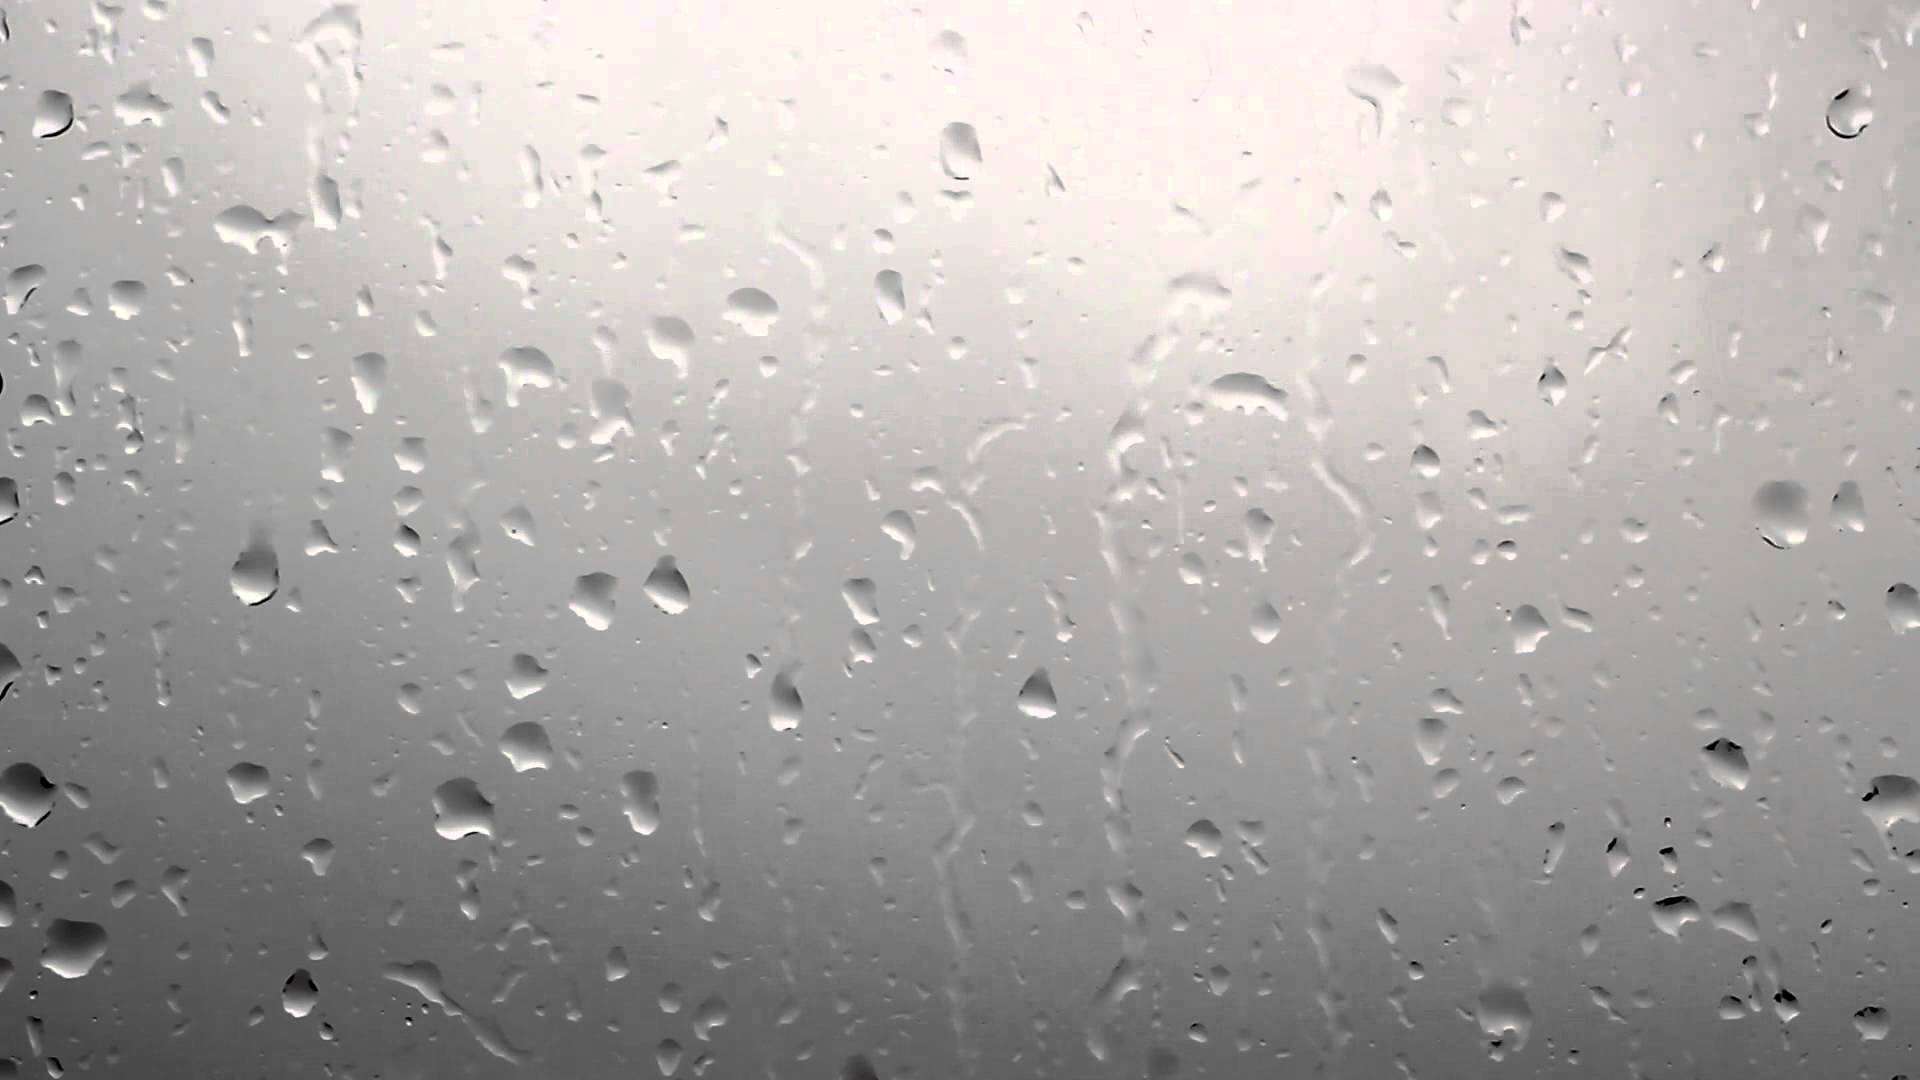 rainy window, raindrops on window dark clouds background - free